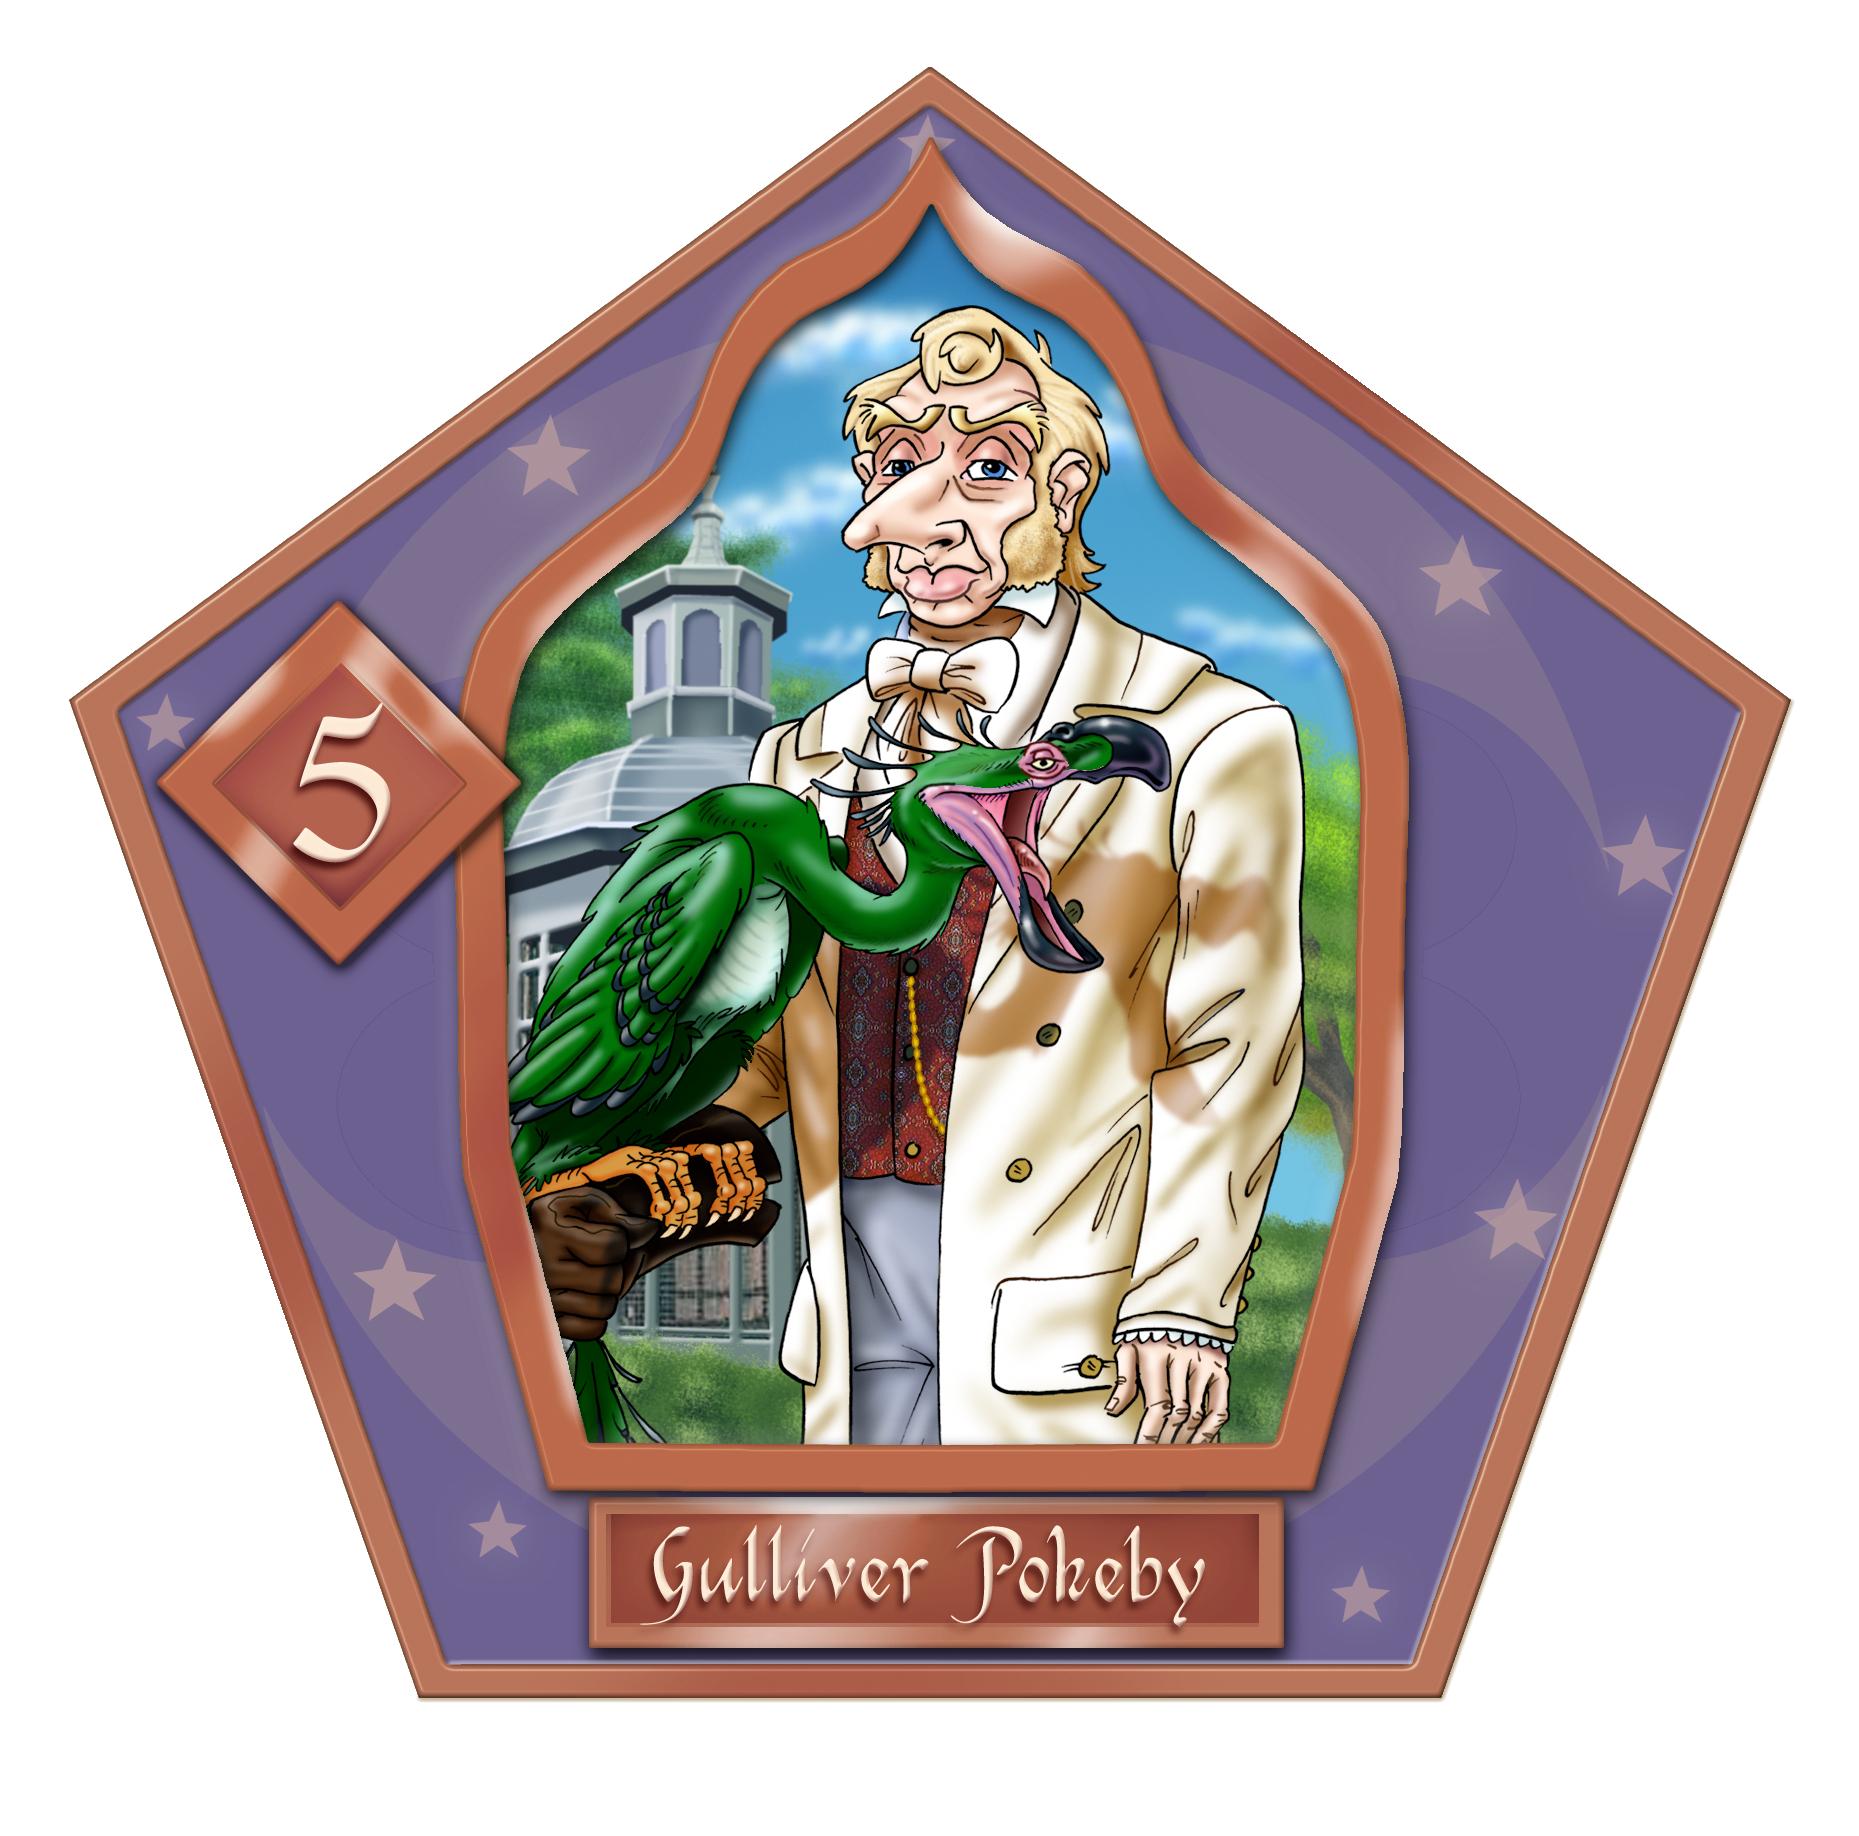 File:Gulliver Pokeby-05-chocFrogCard.png